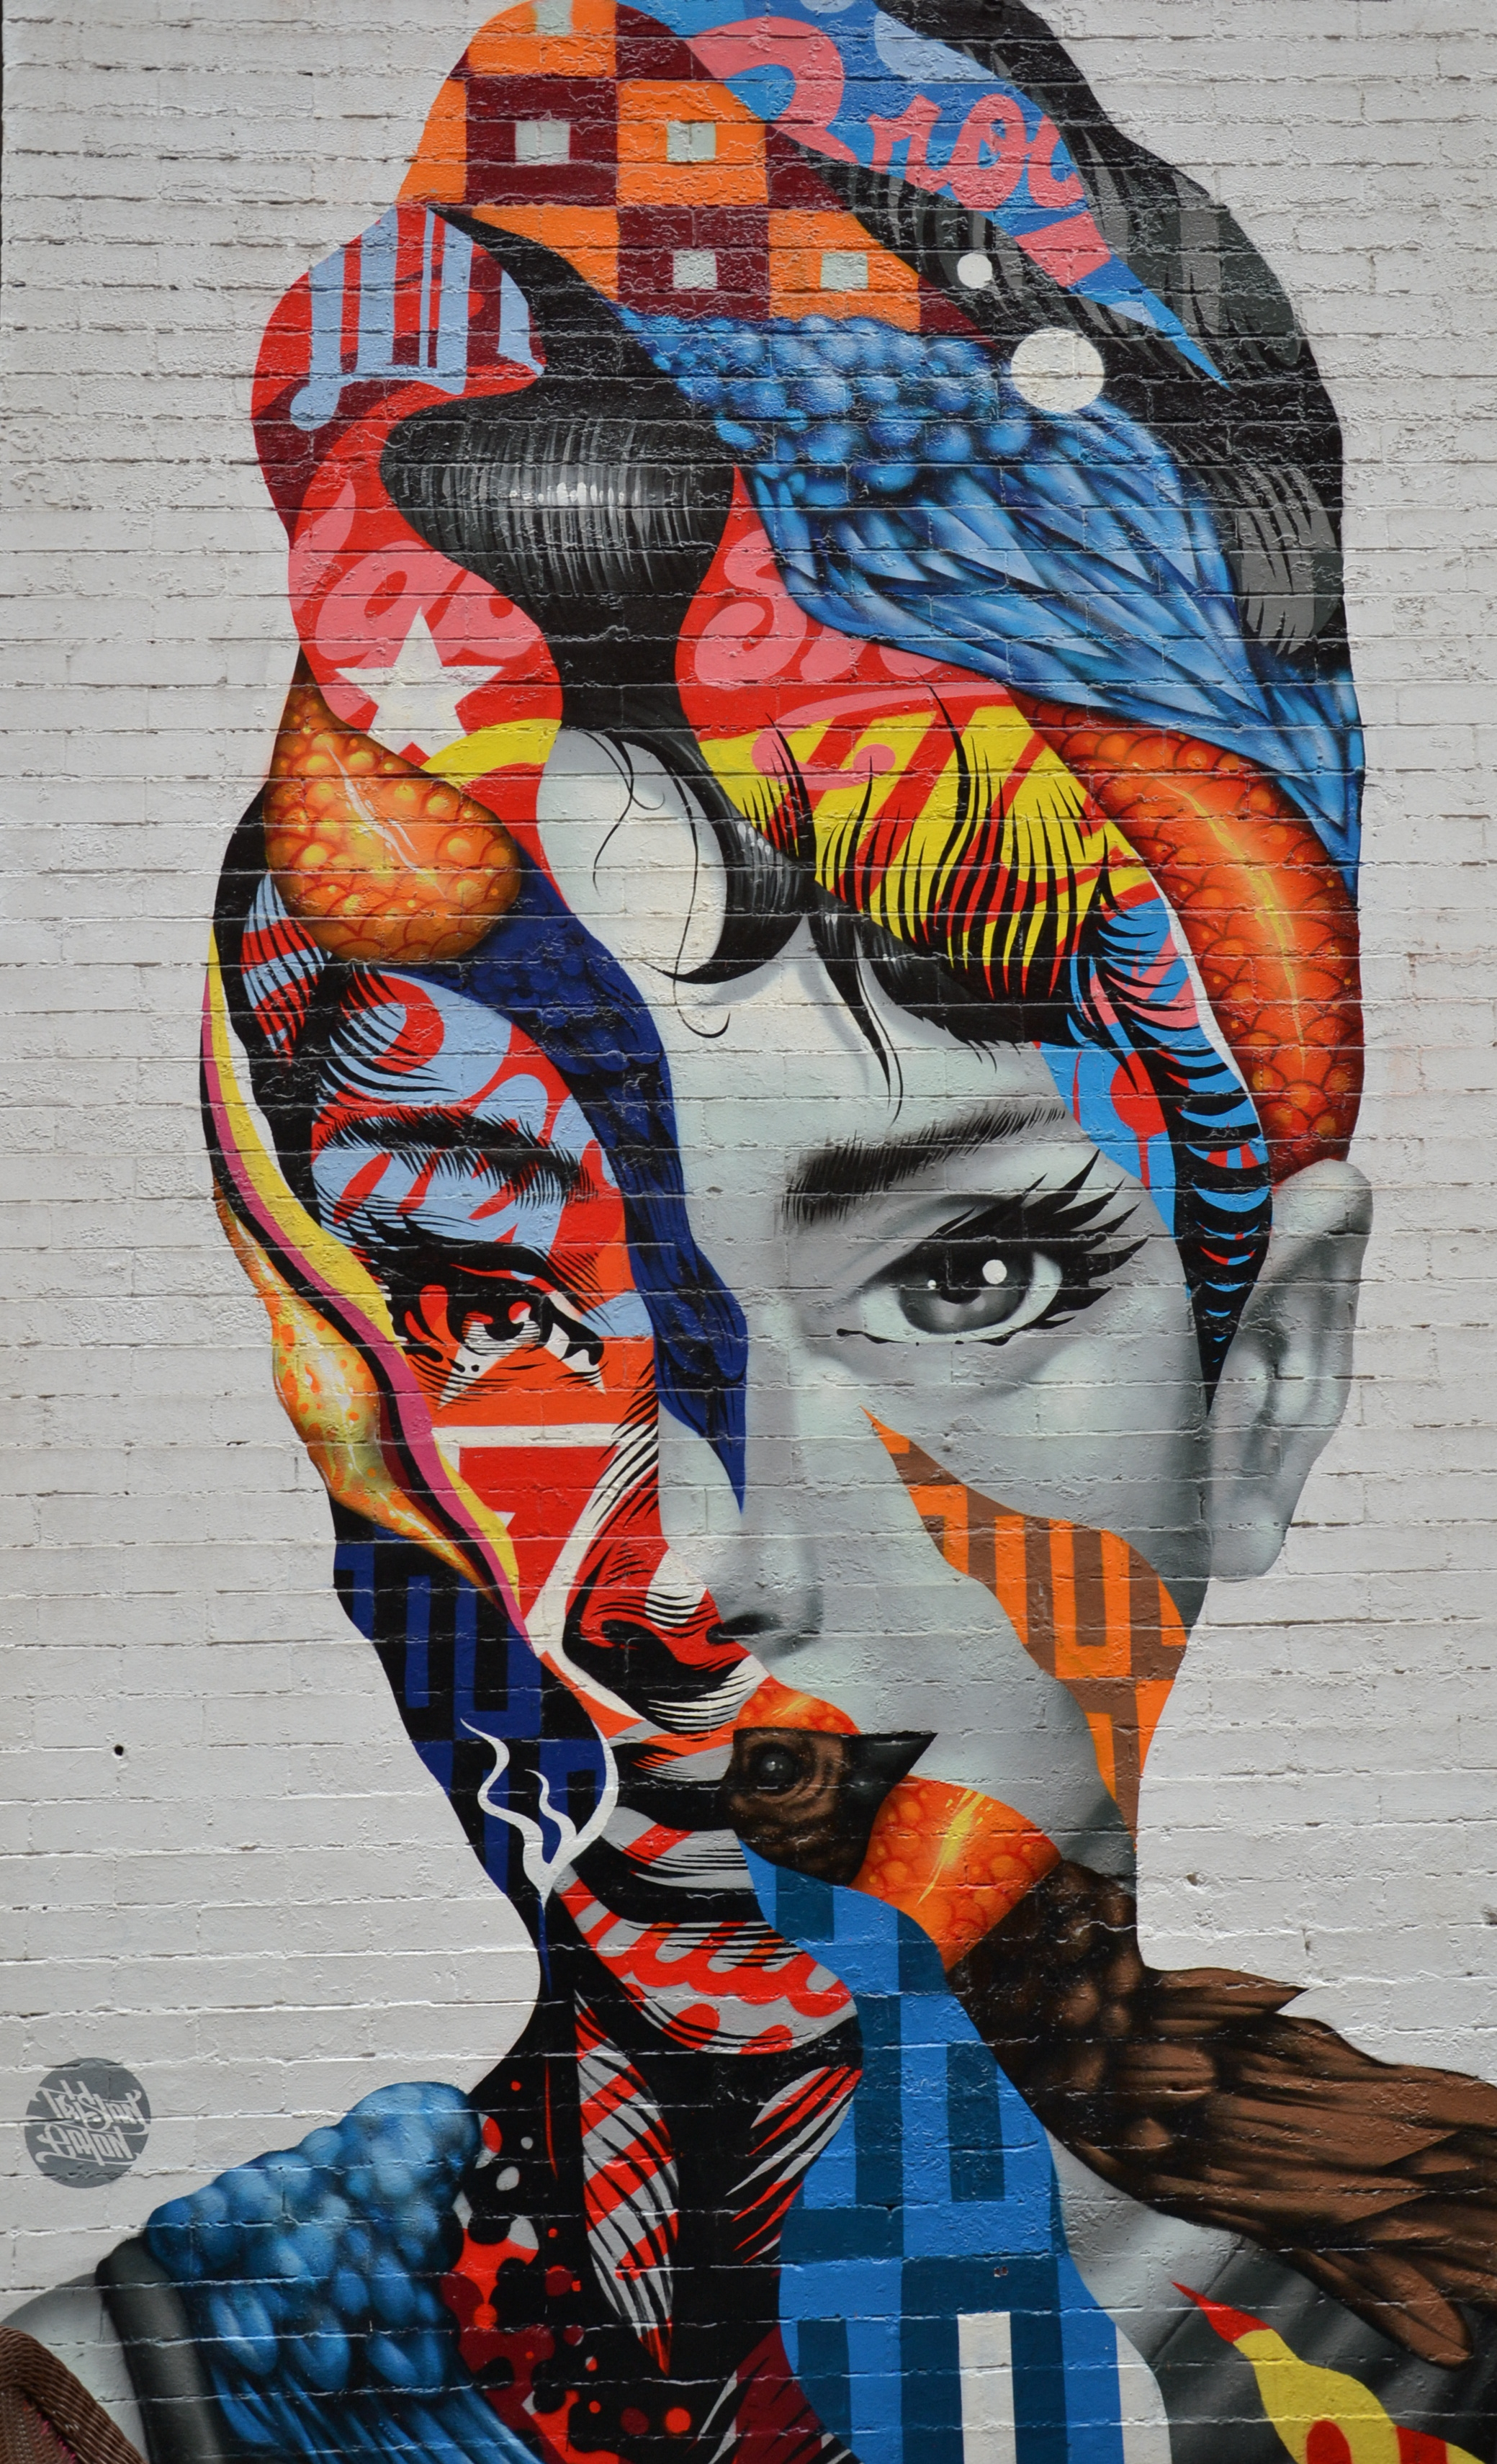 NYC Street Art - Tendencias Diseño Gráfico 2019